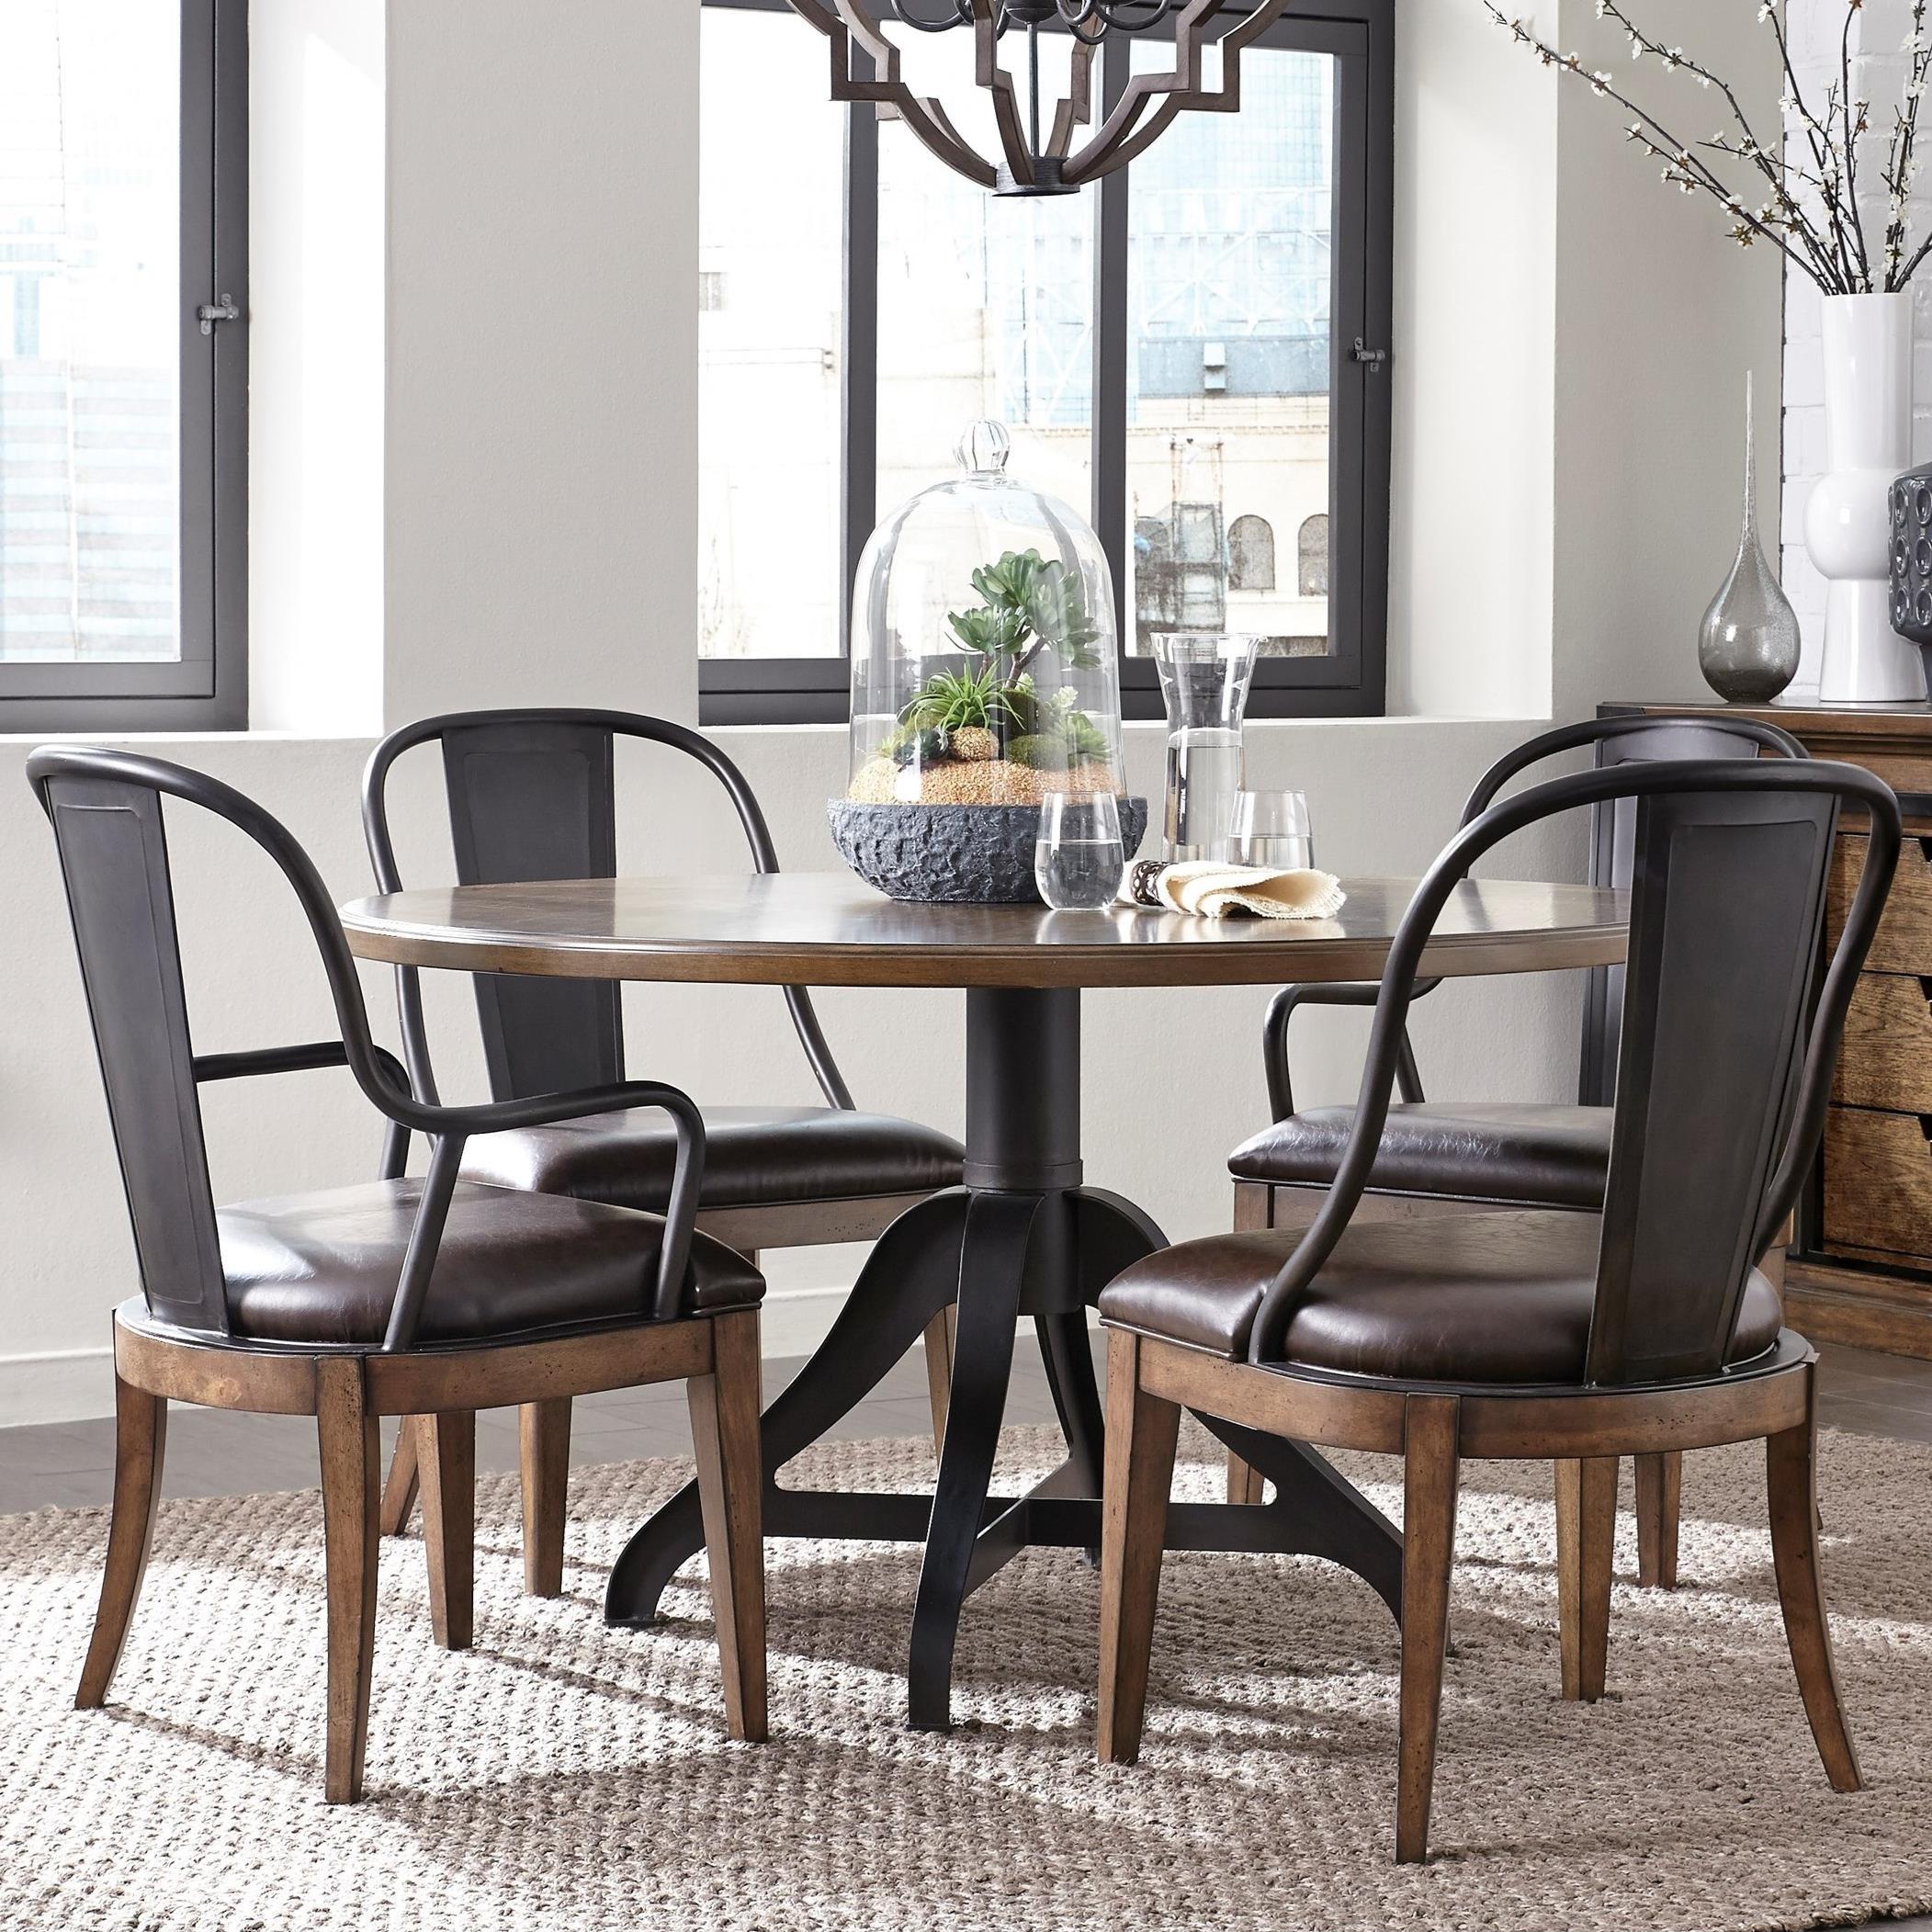 Pulaski Furniture Weston Loft 5 Piece Table and Chair Set - Item Number: P001230+1+2x271+2x270